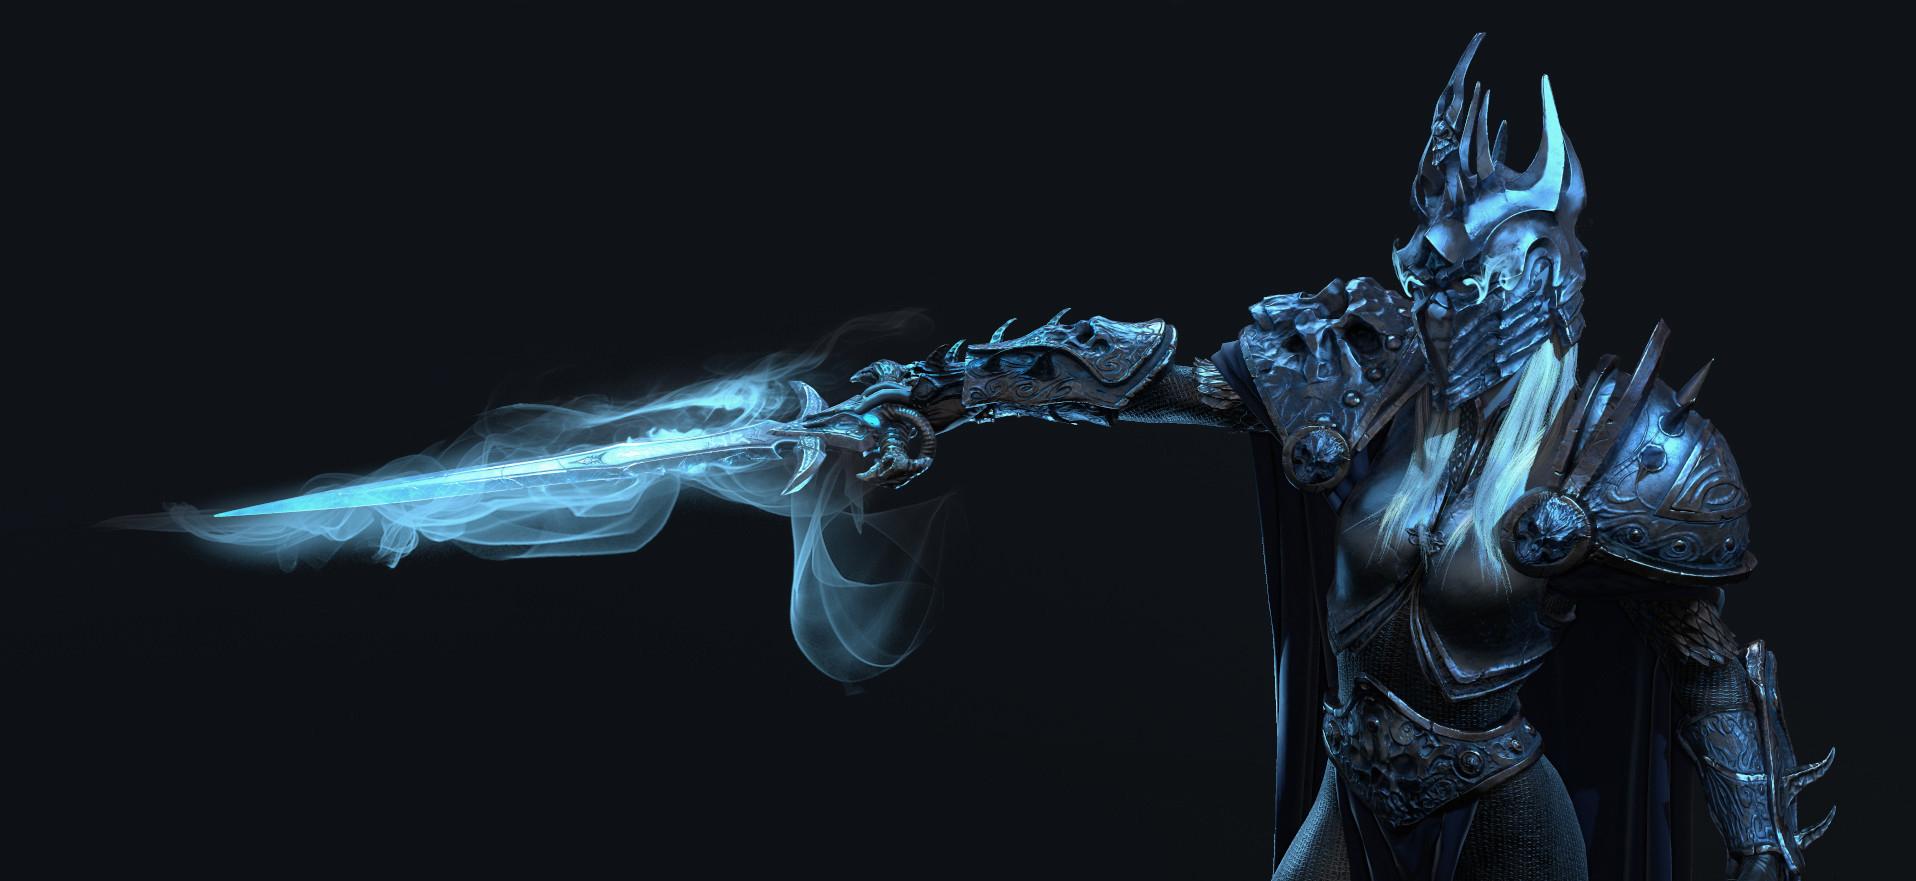 6.jpg - World of Warcraft